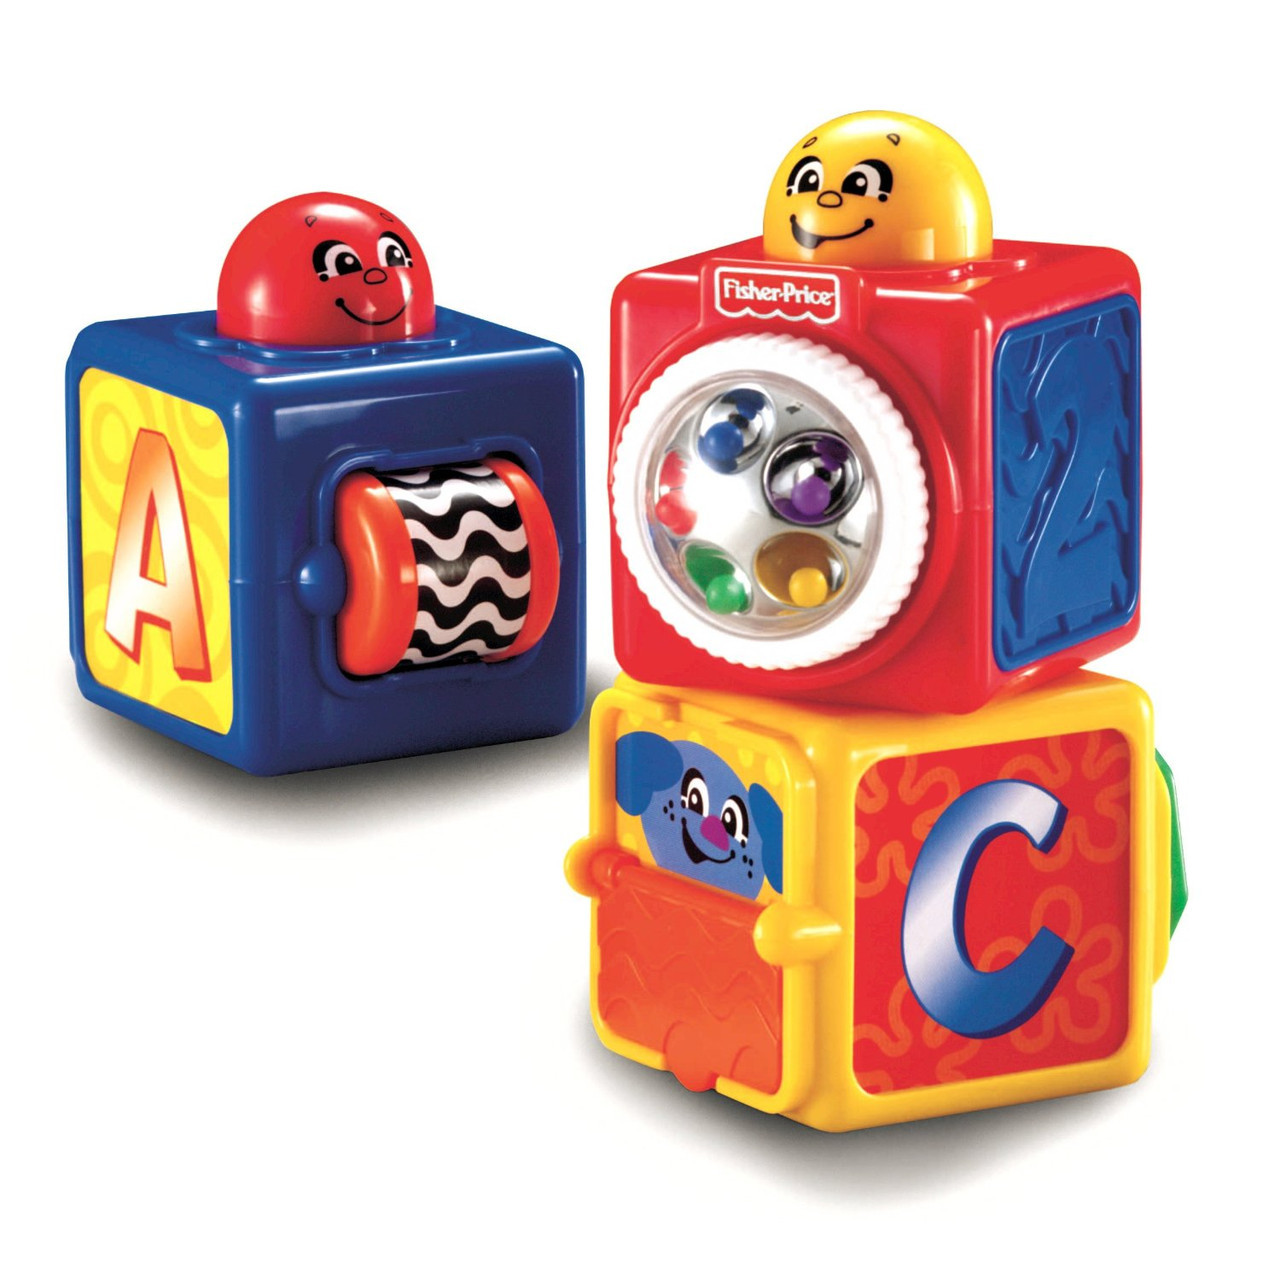 Кубики детские двигающиеся Фишер Прайс Fisher Price 74121